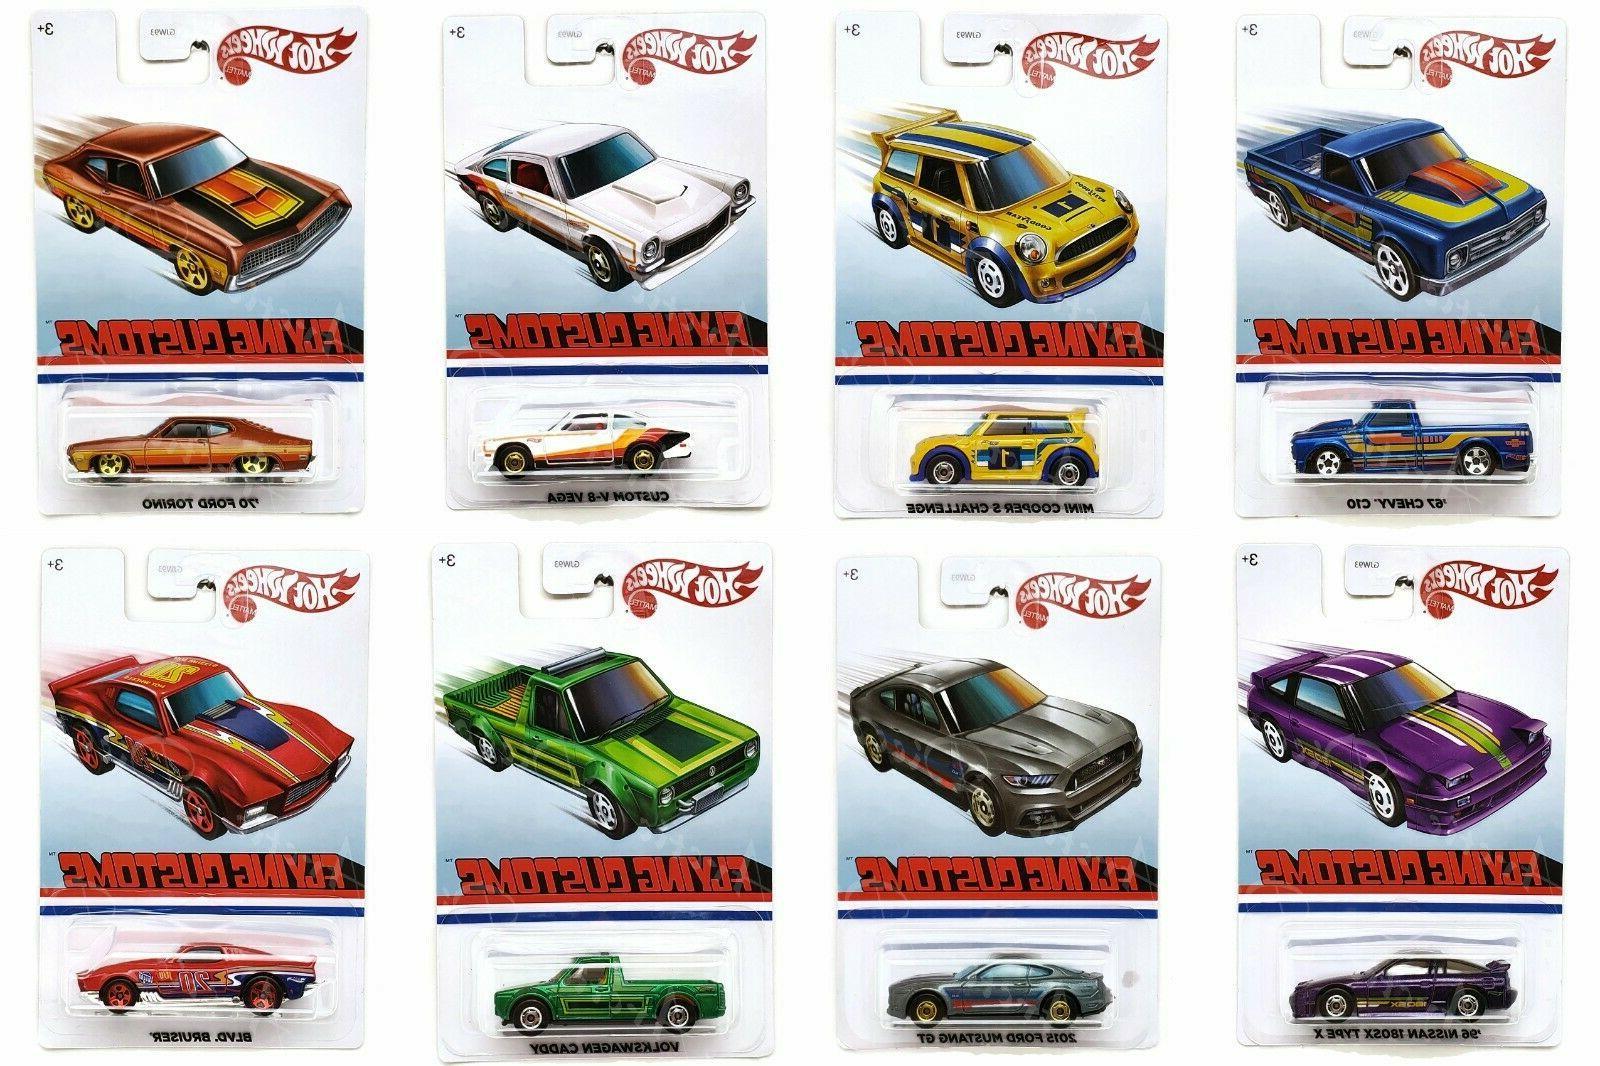 Hot Wheels Customs Mix 2 Target Exclusive Pick 8/26